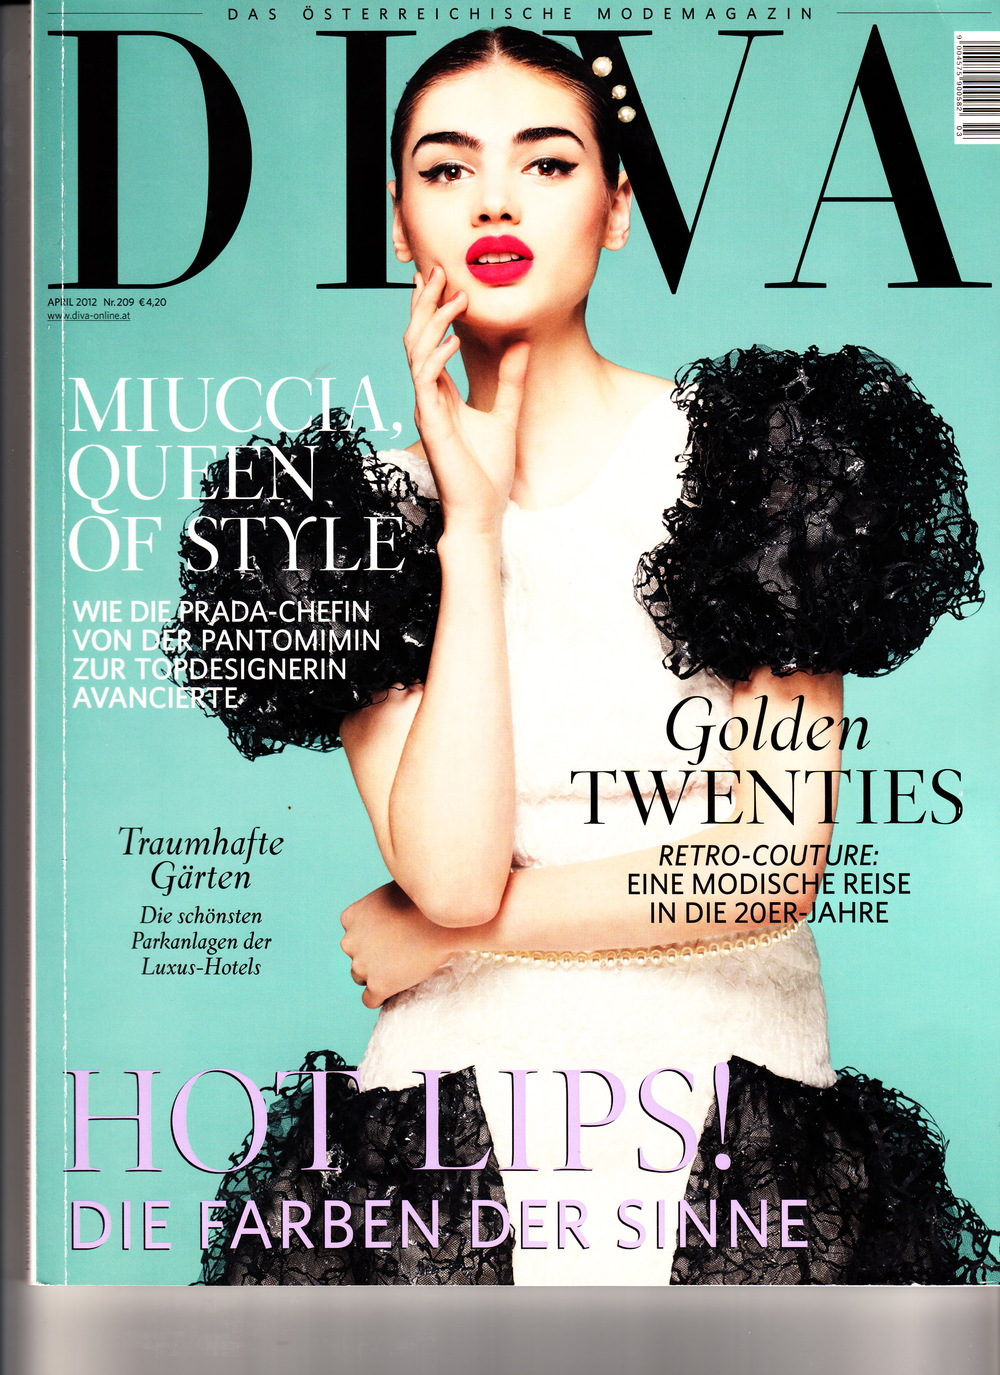 DIVA April 2012 Cover.jpg